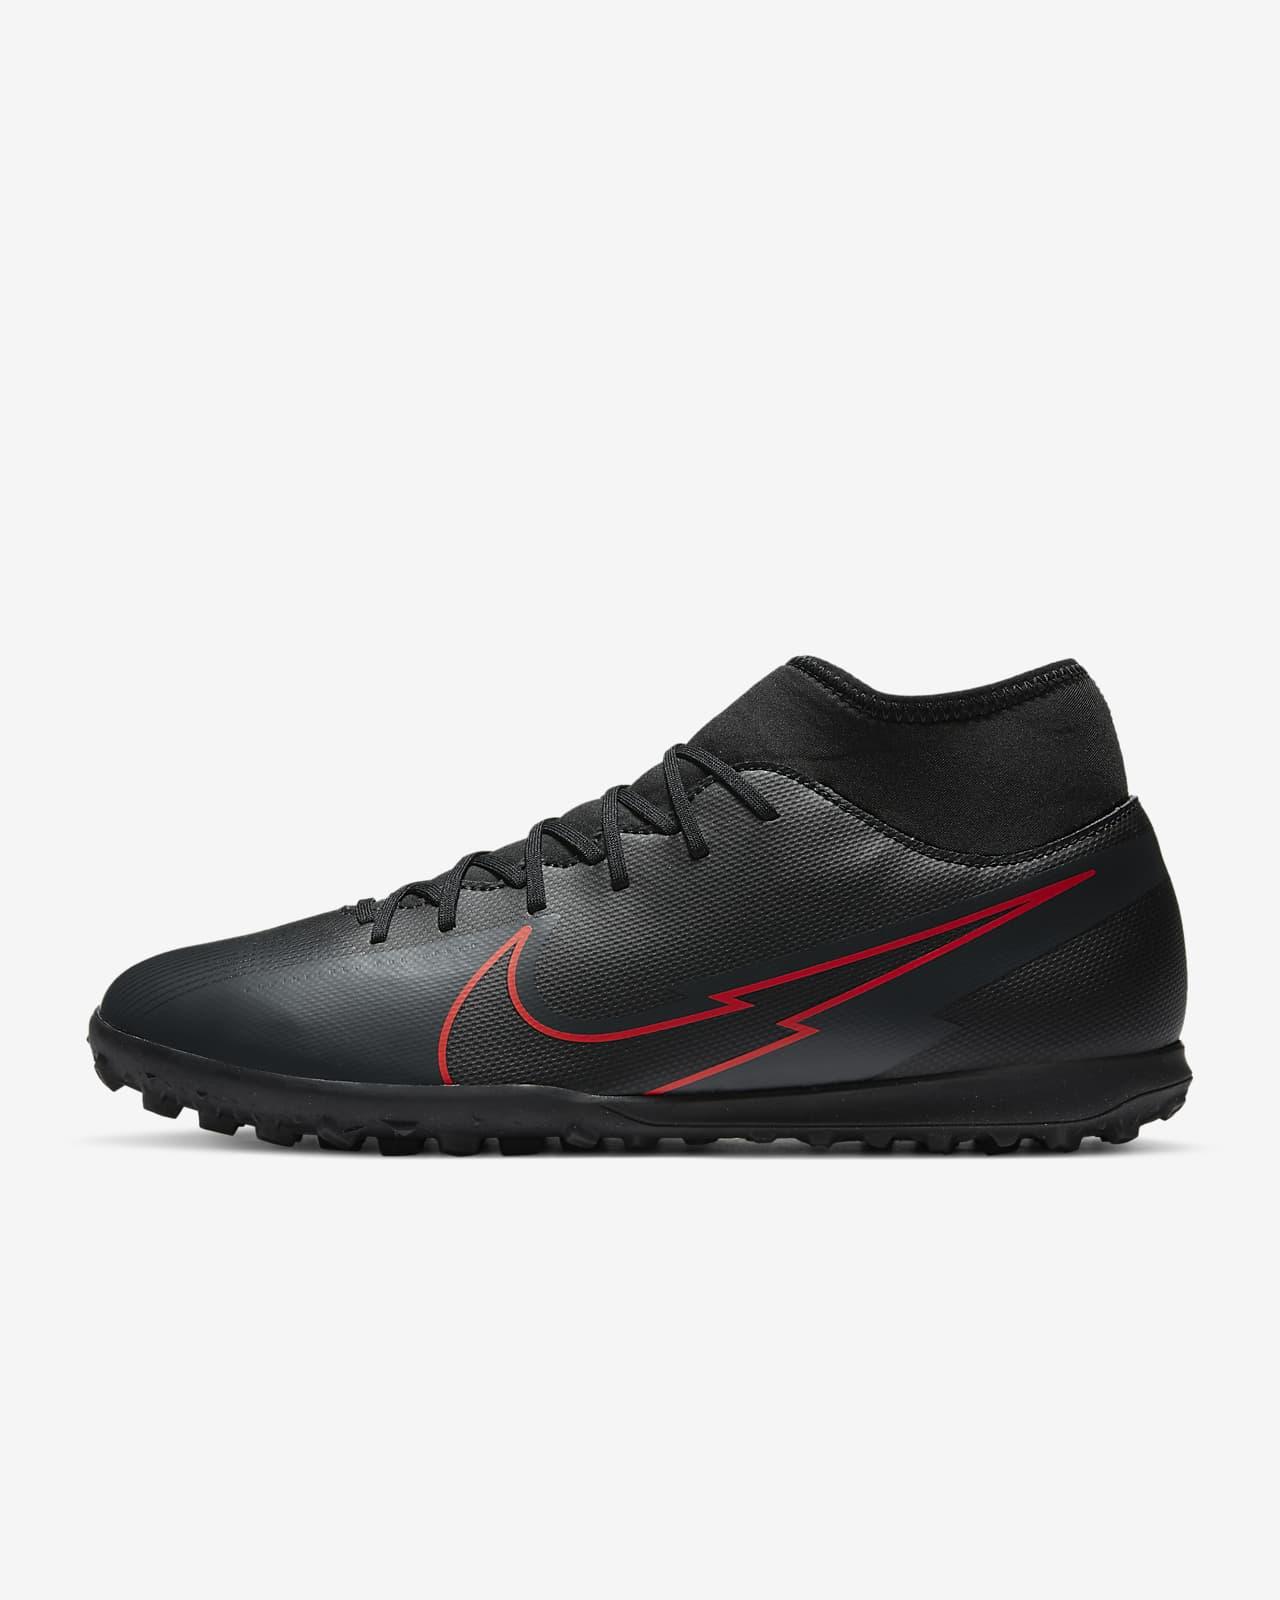 Scarpa da calcio per erba artificiale/sintetica Nike Mercurial Superfly 7 Club TF